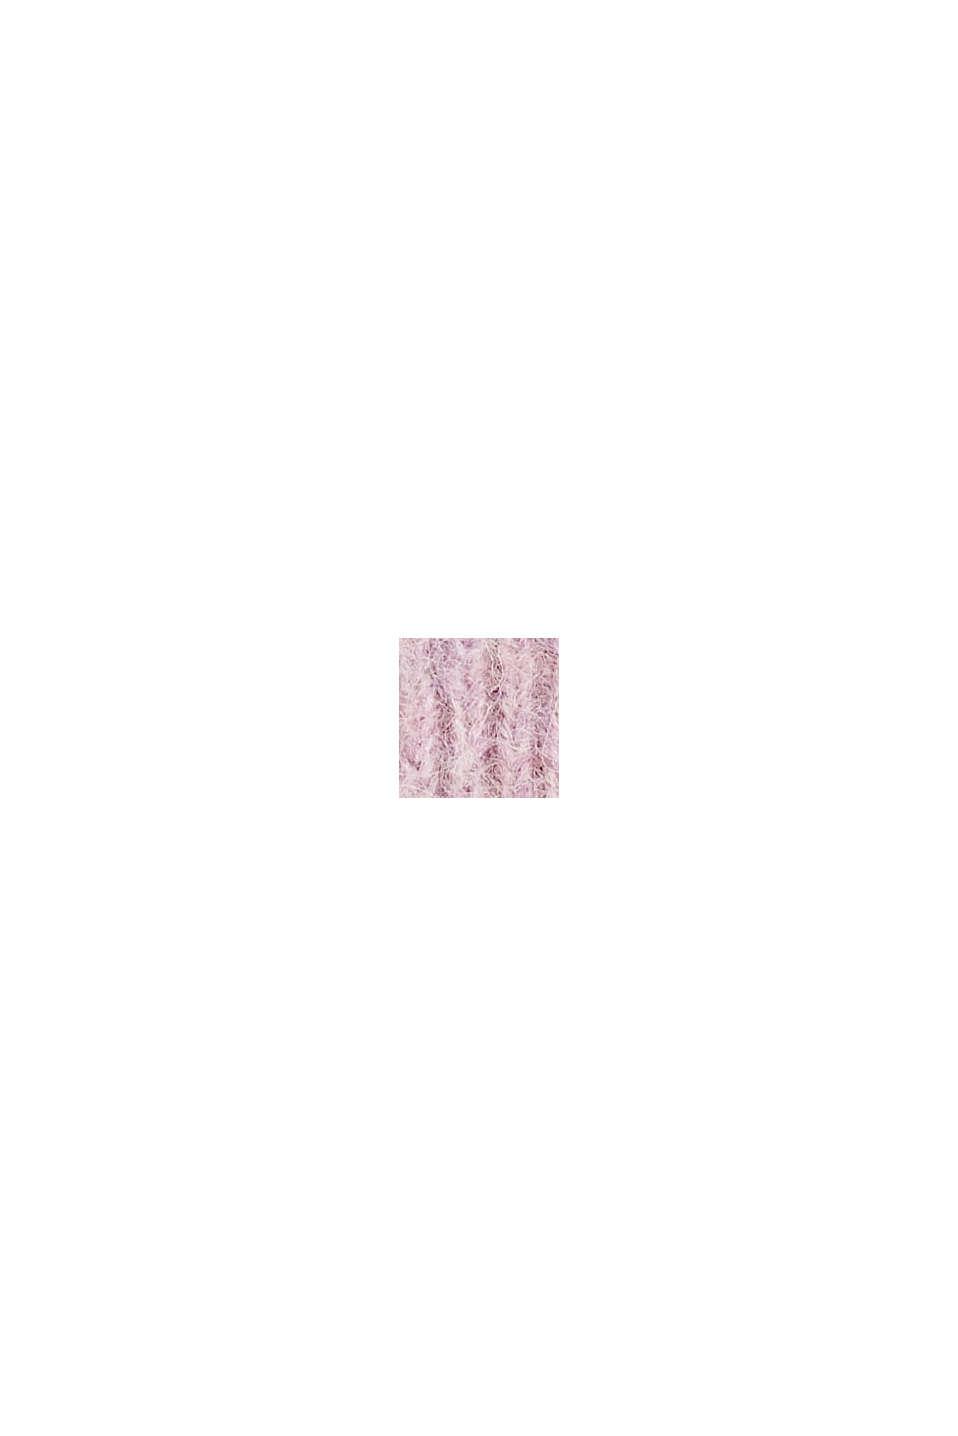 Rib knit beanie in a wool/alpaca blend, MAUVE, swatch